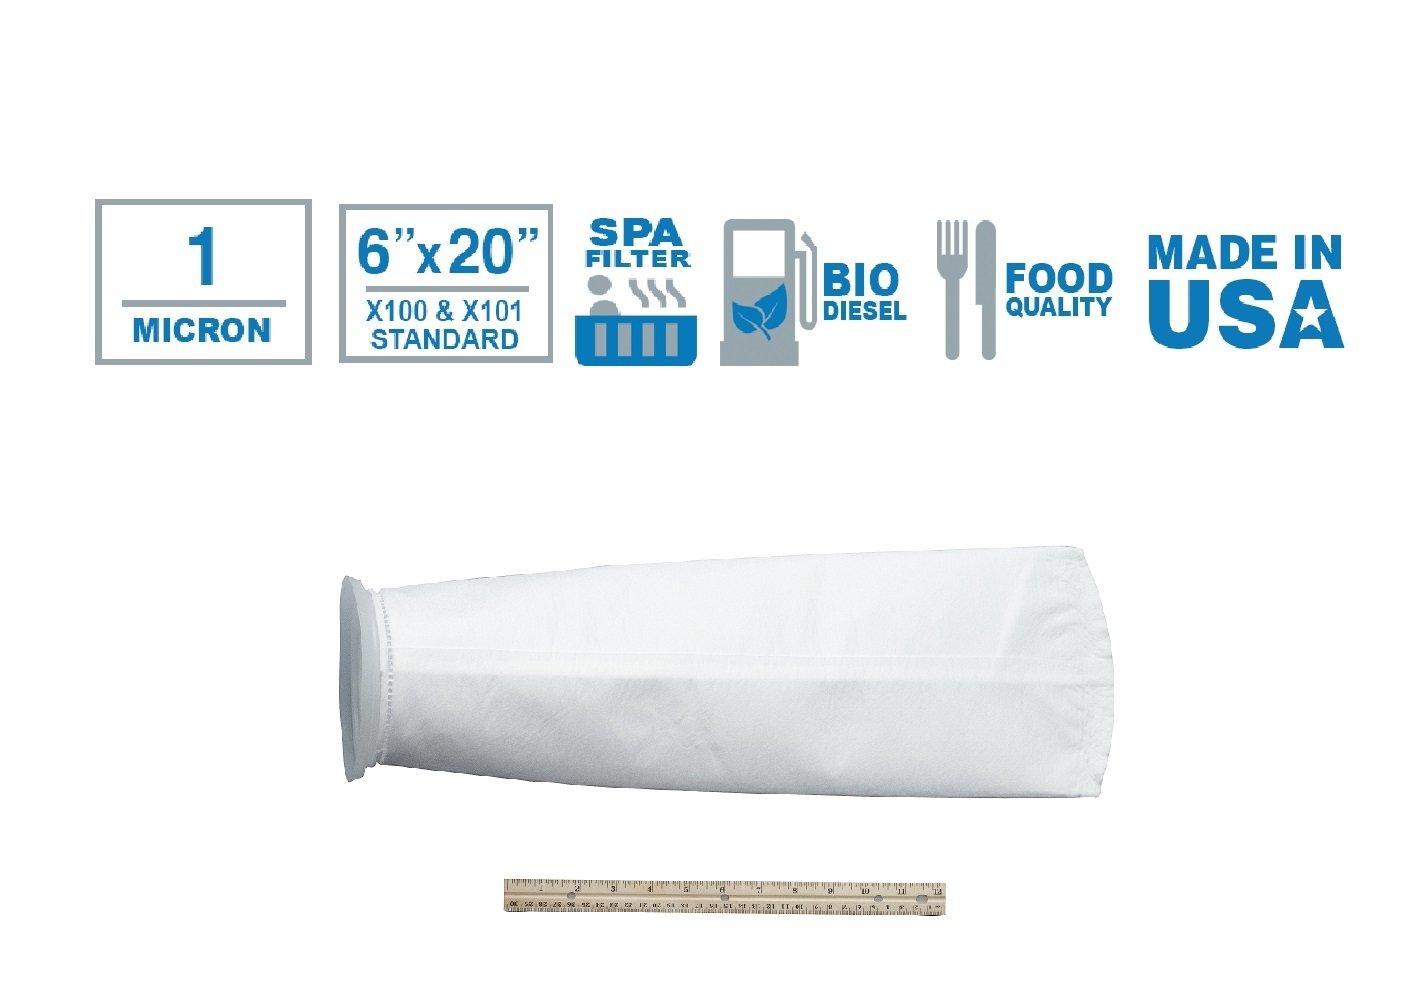 Lot of 10 #2 Filter Bag Nylon Monofilament Mesh Polypropylene Ring 149 Micron